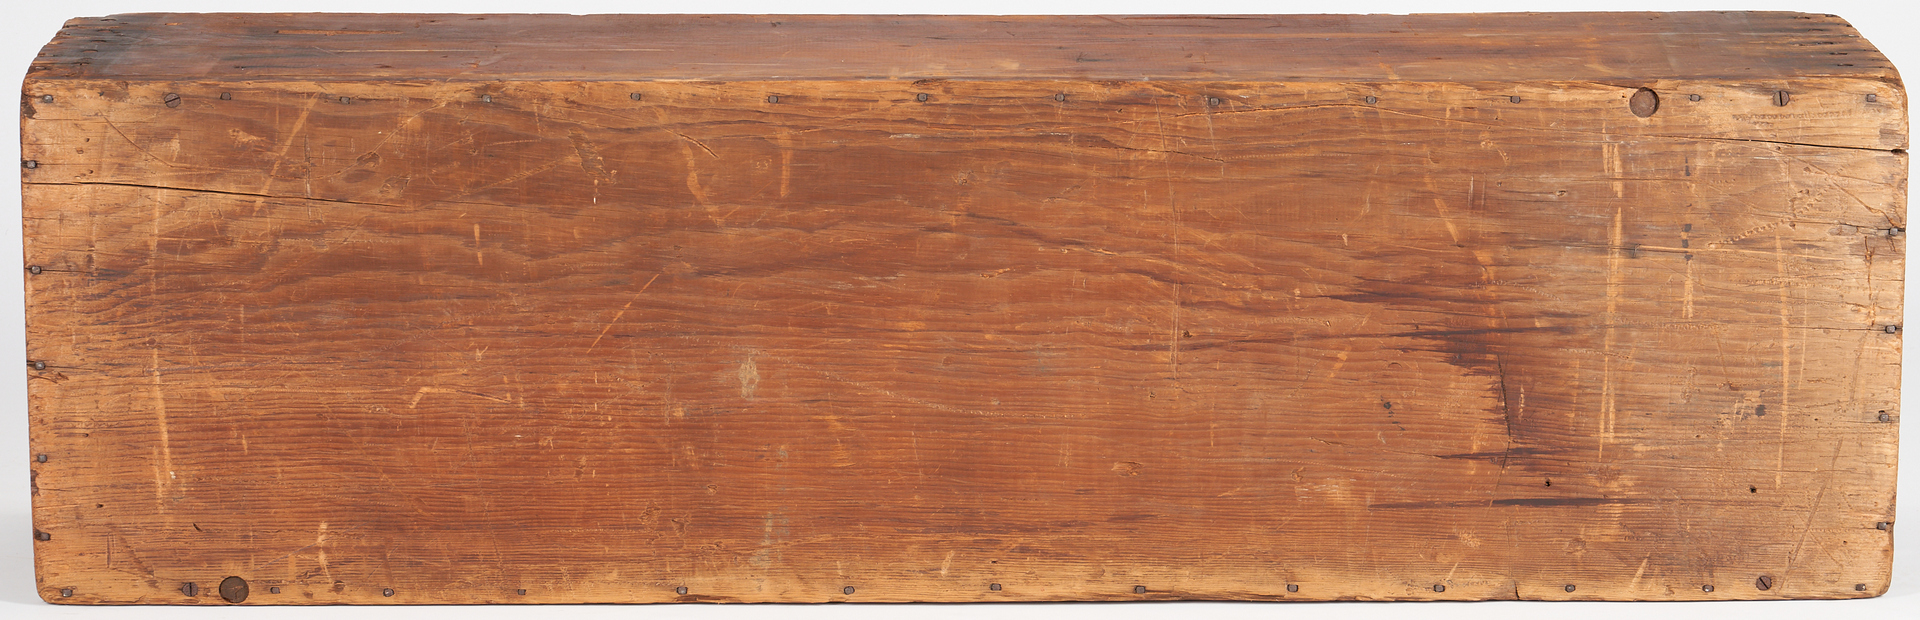 Lot 766: Civil War Colt Special Model 1861 Pine Packing Crate